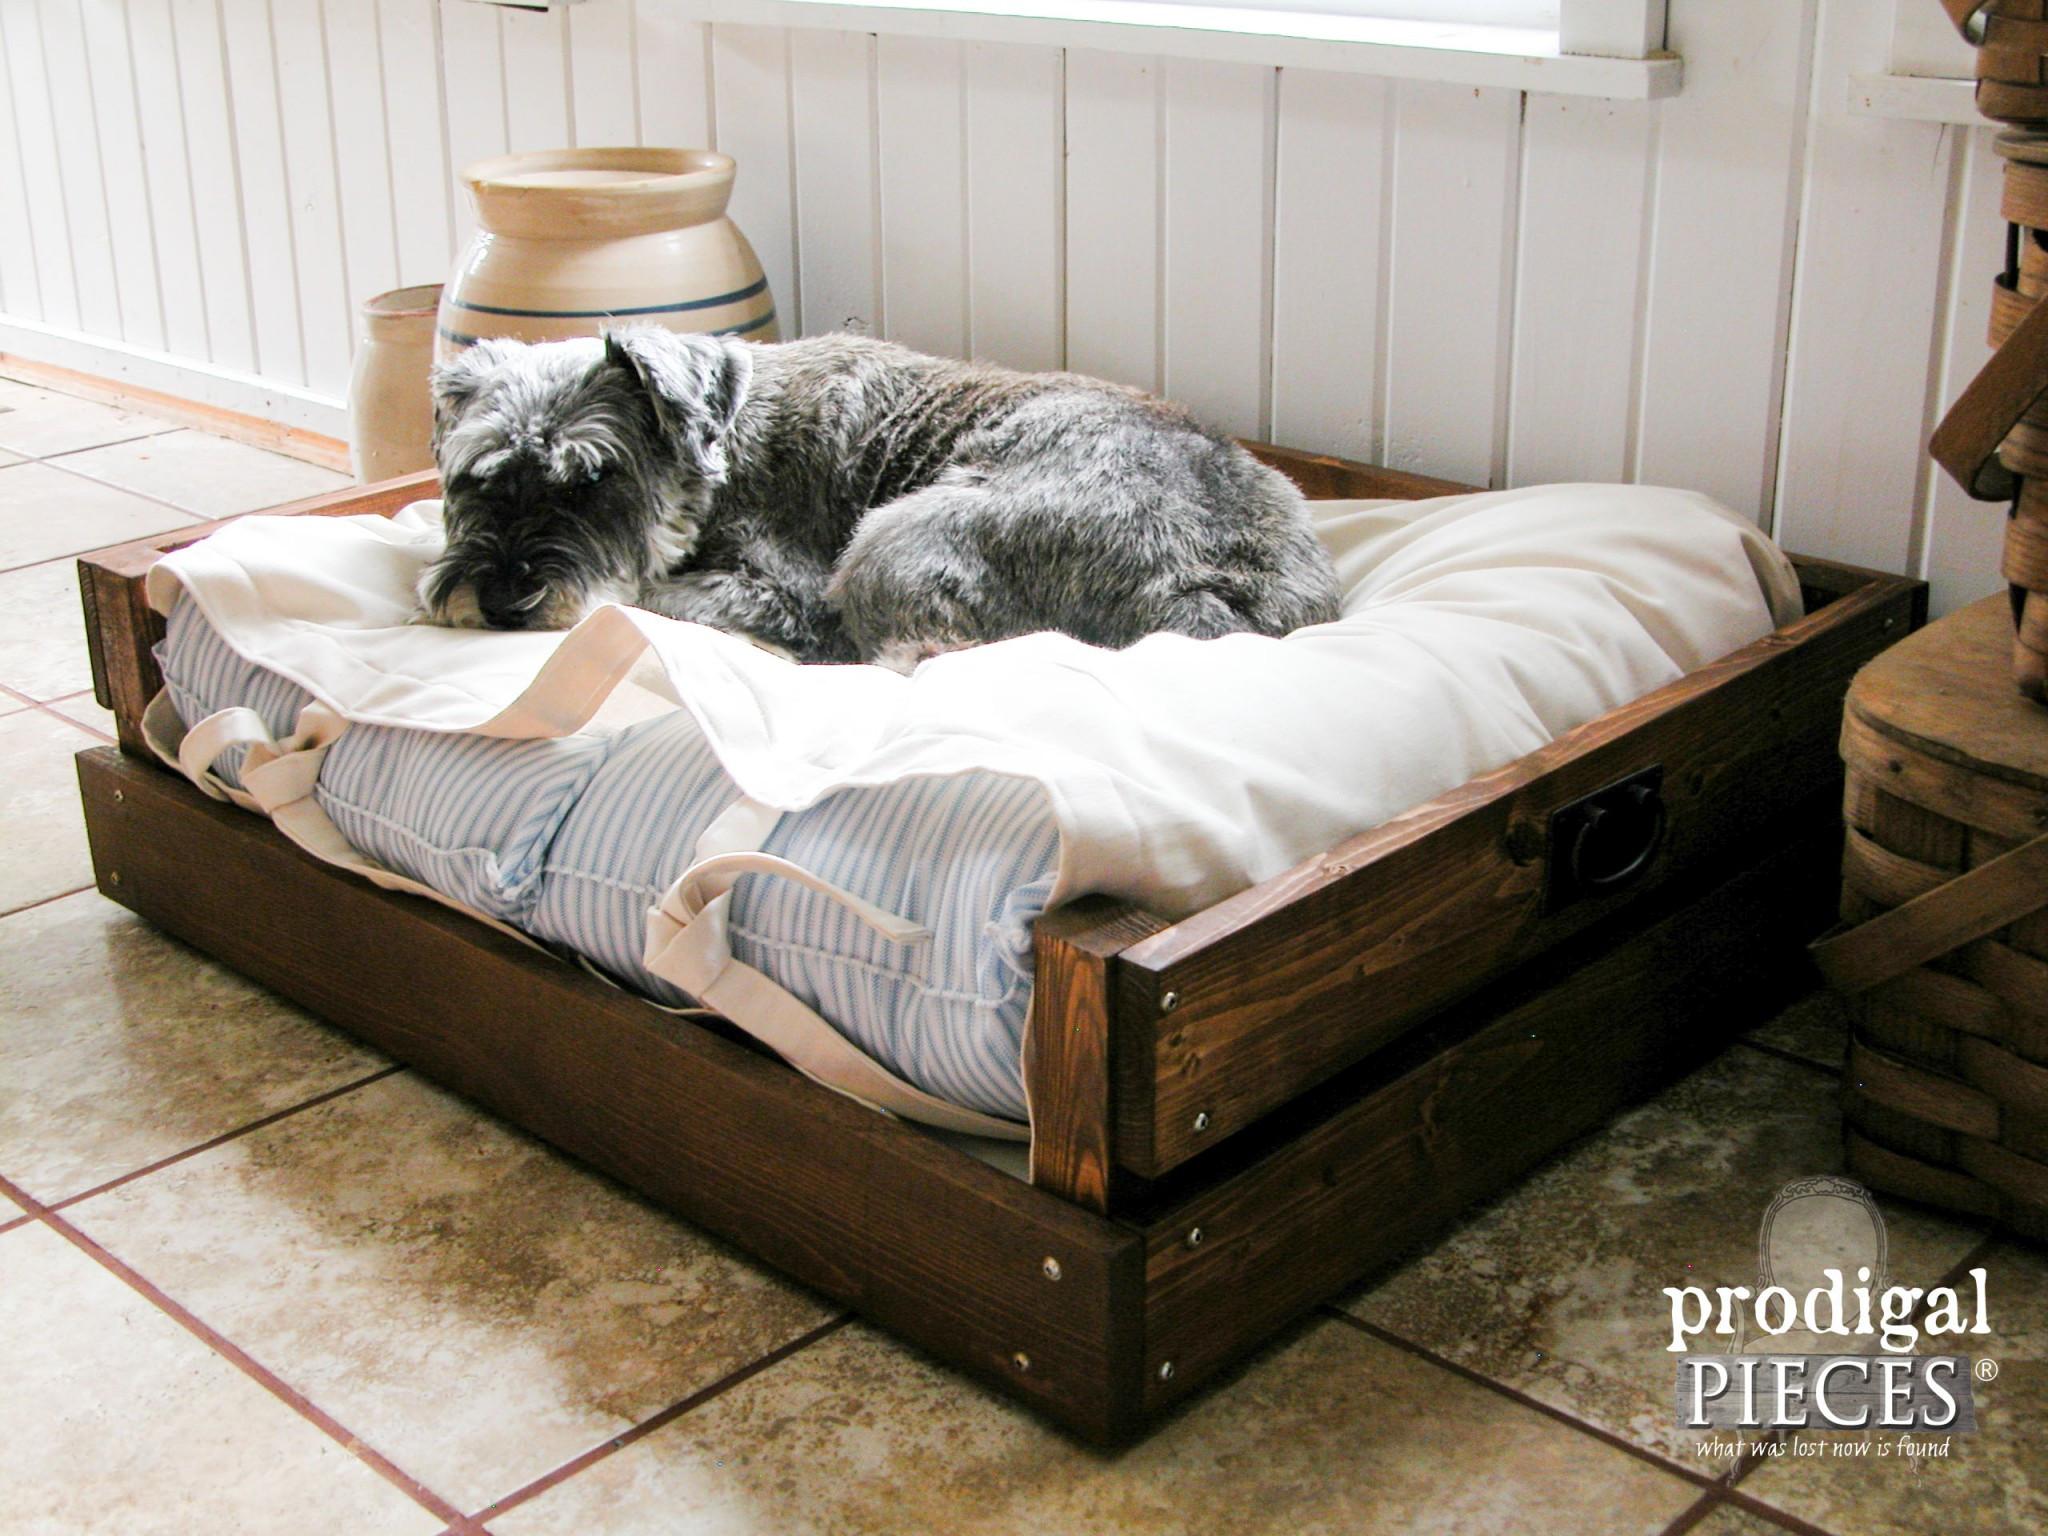 Best ideas about DIY Pet Beds . Save or Pin Pet Bed DIY Building Plans & Tutorial Prodigal Pieces Now.